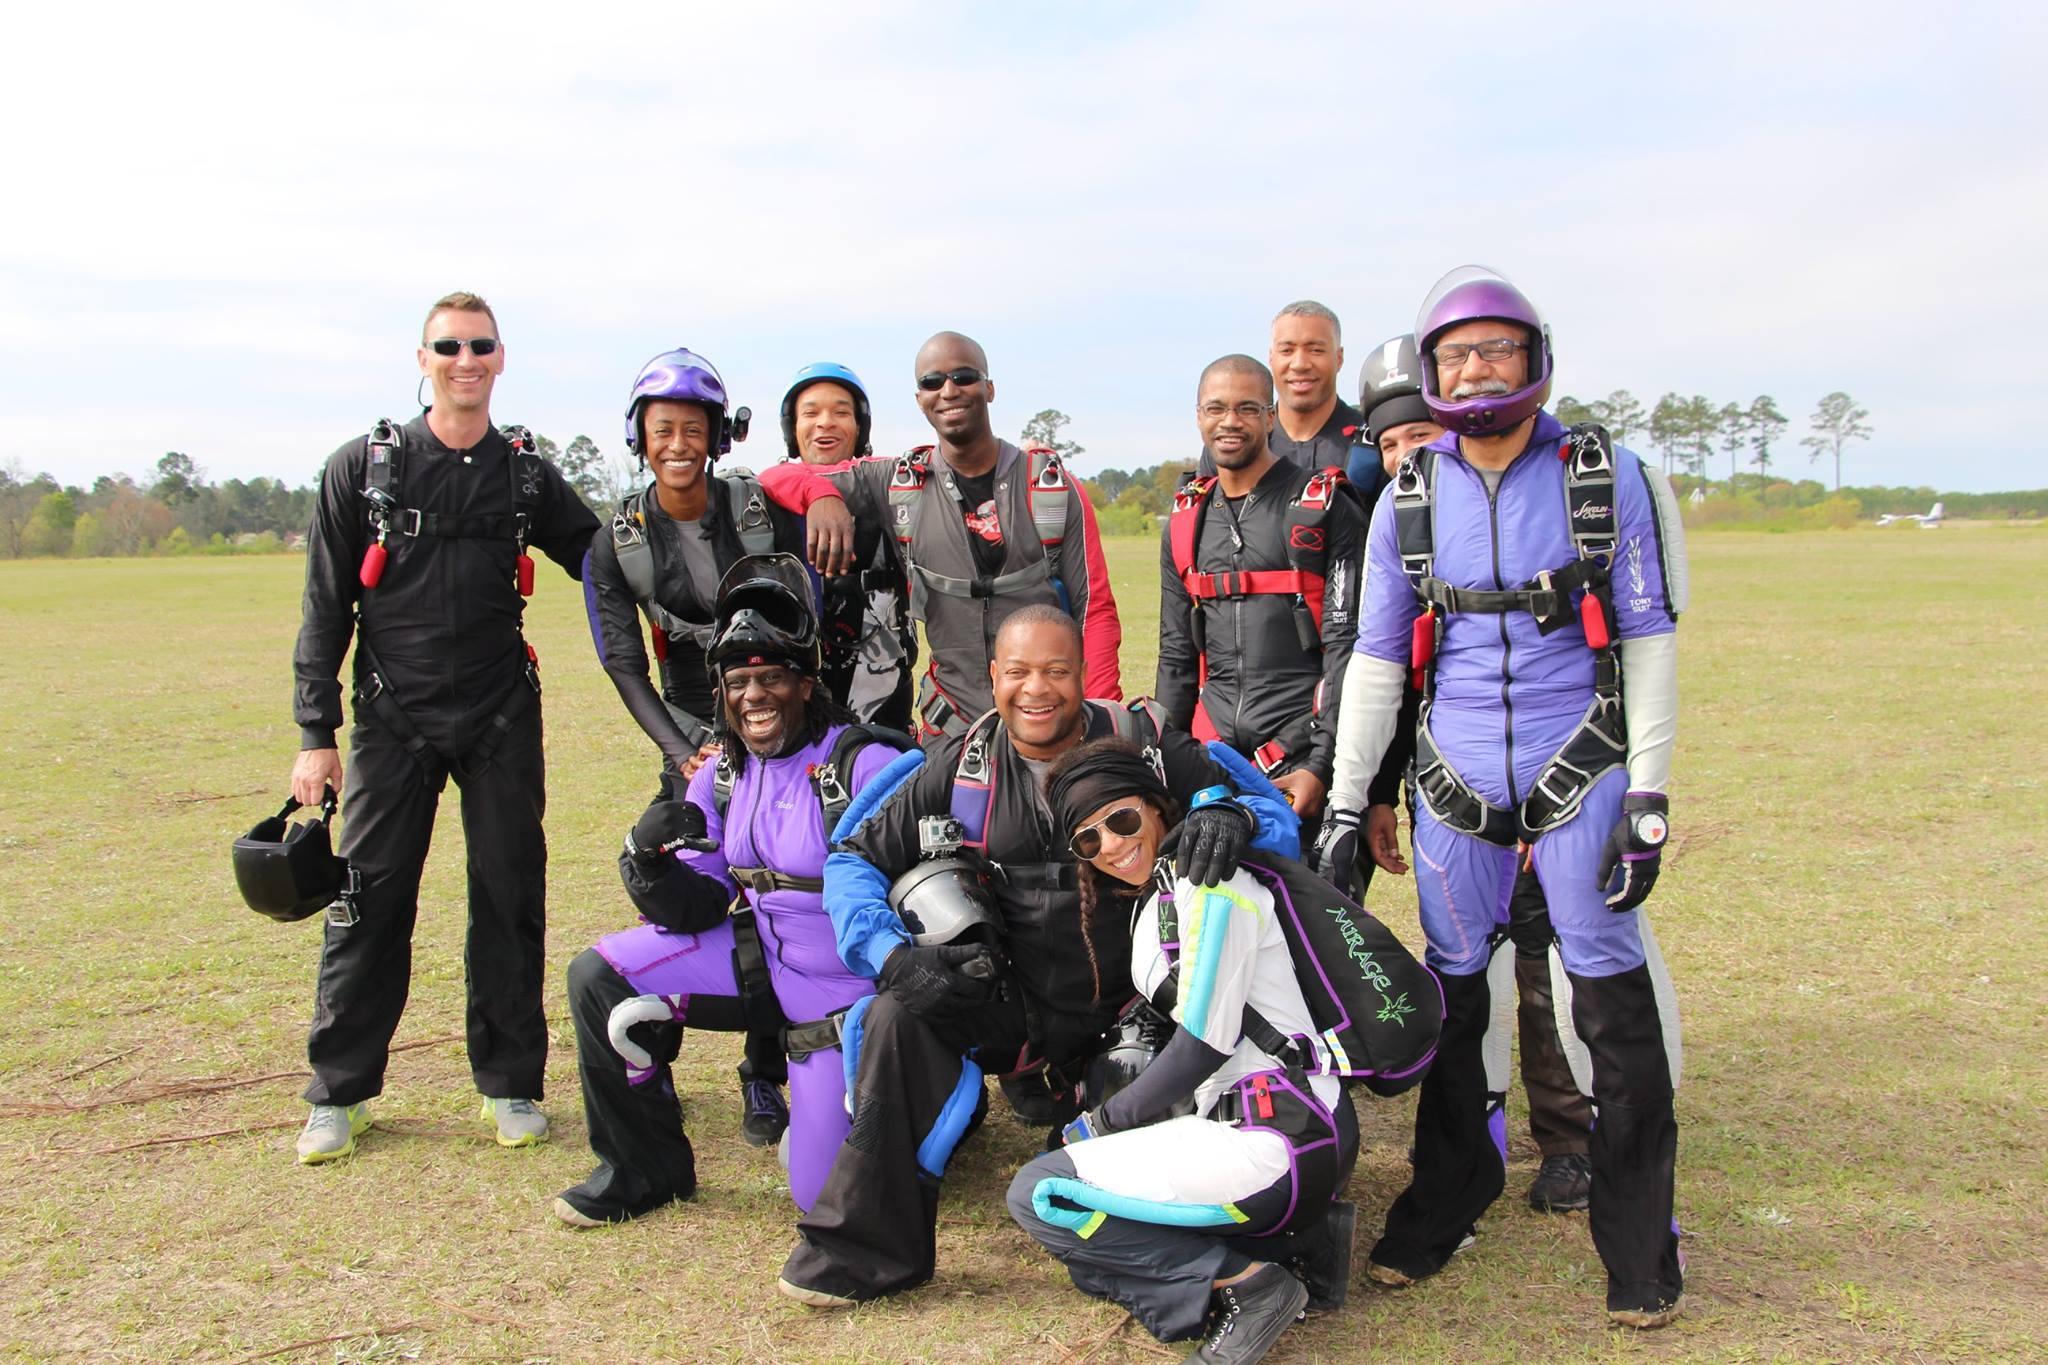 Team Blackstar Skydivers  at a 2015 record jump in Fitzgerald, GA.